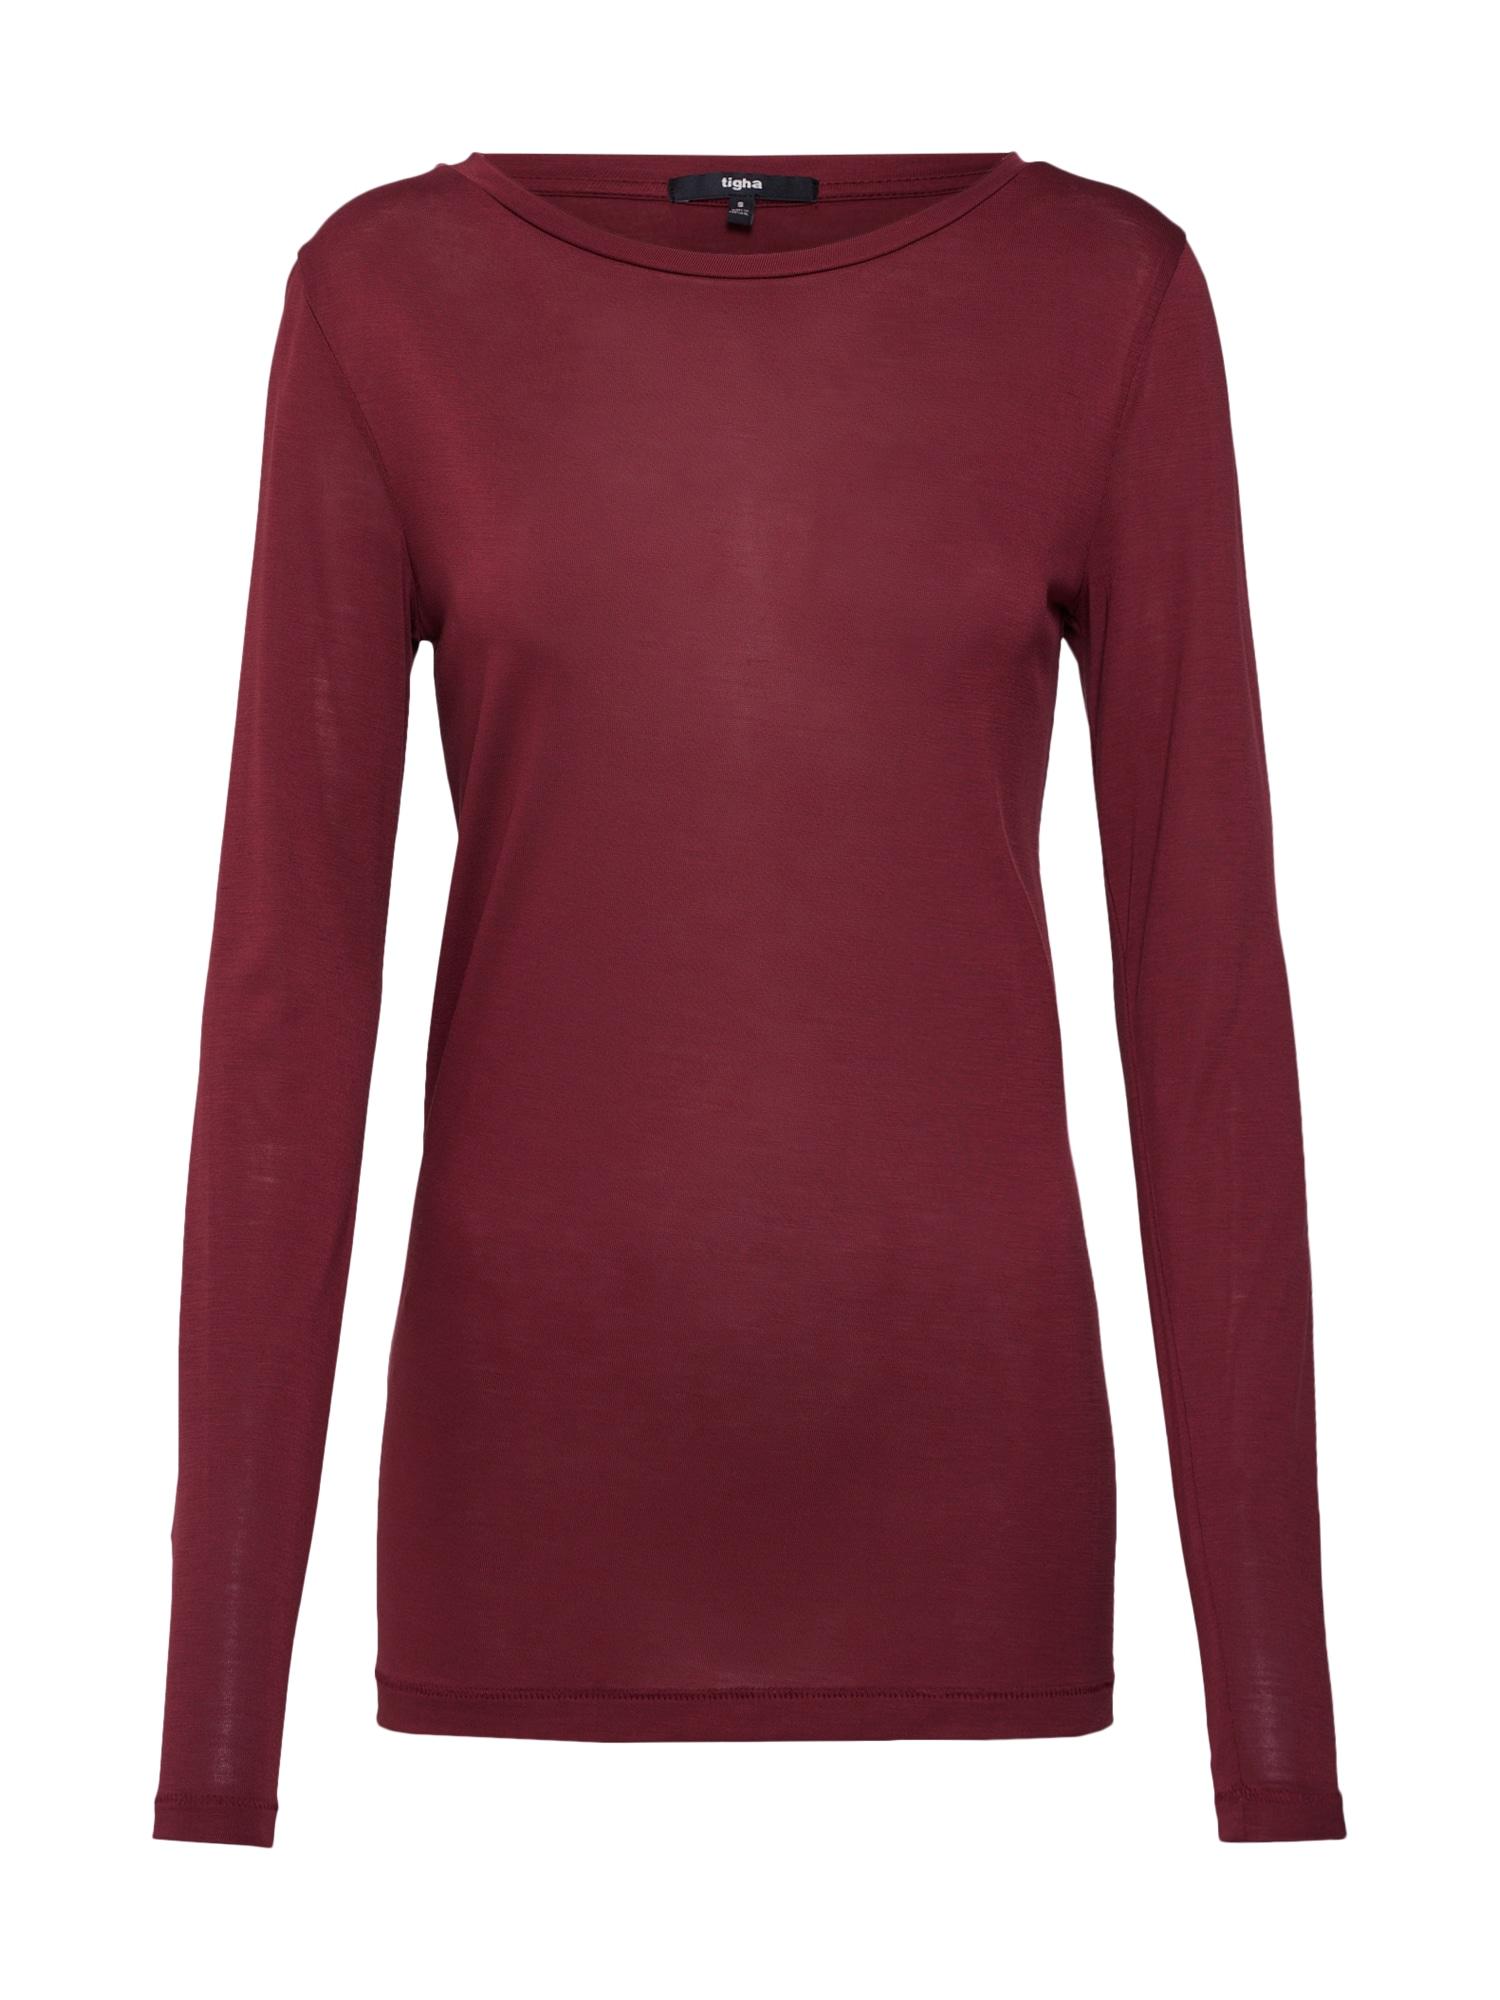 Tričko Lora vínově červená Tigha